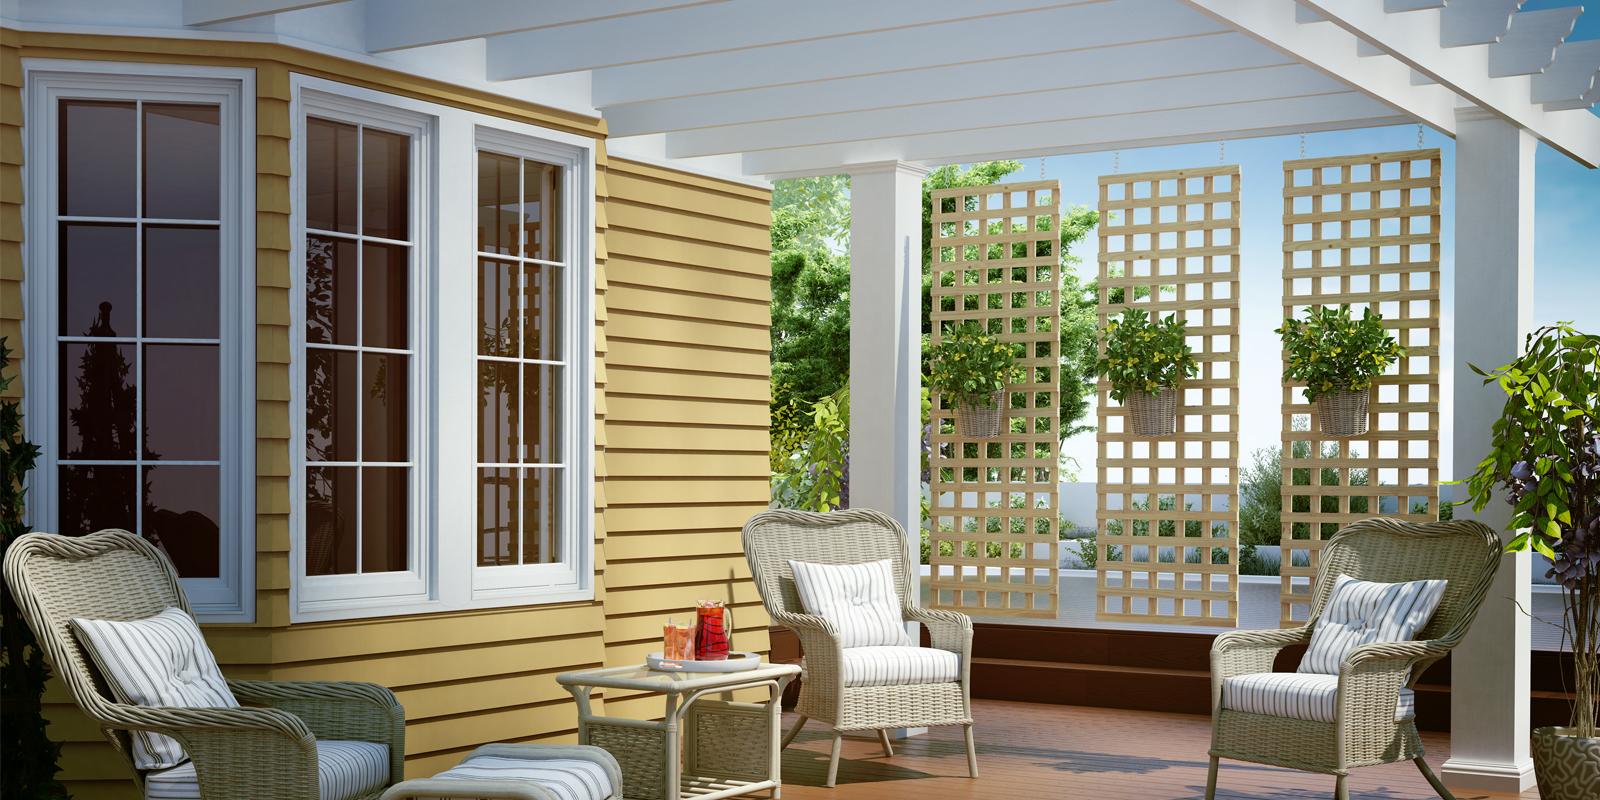 Lattice Fence Functional Amp Decorative Decor Or Design